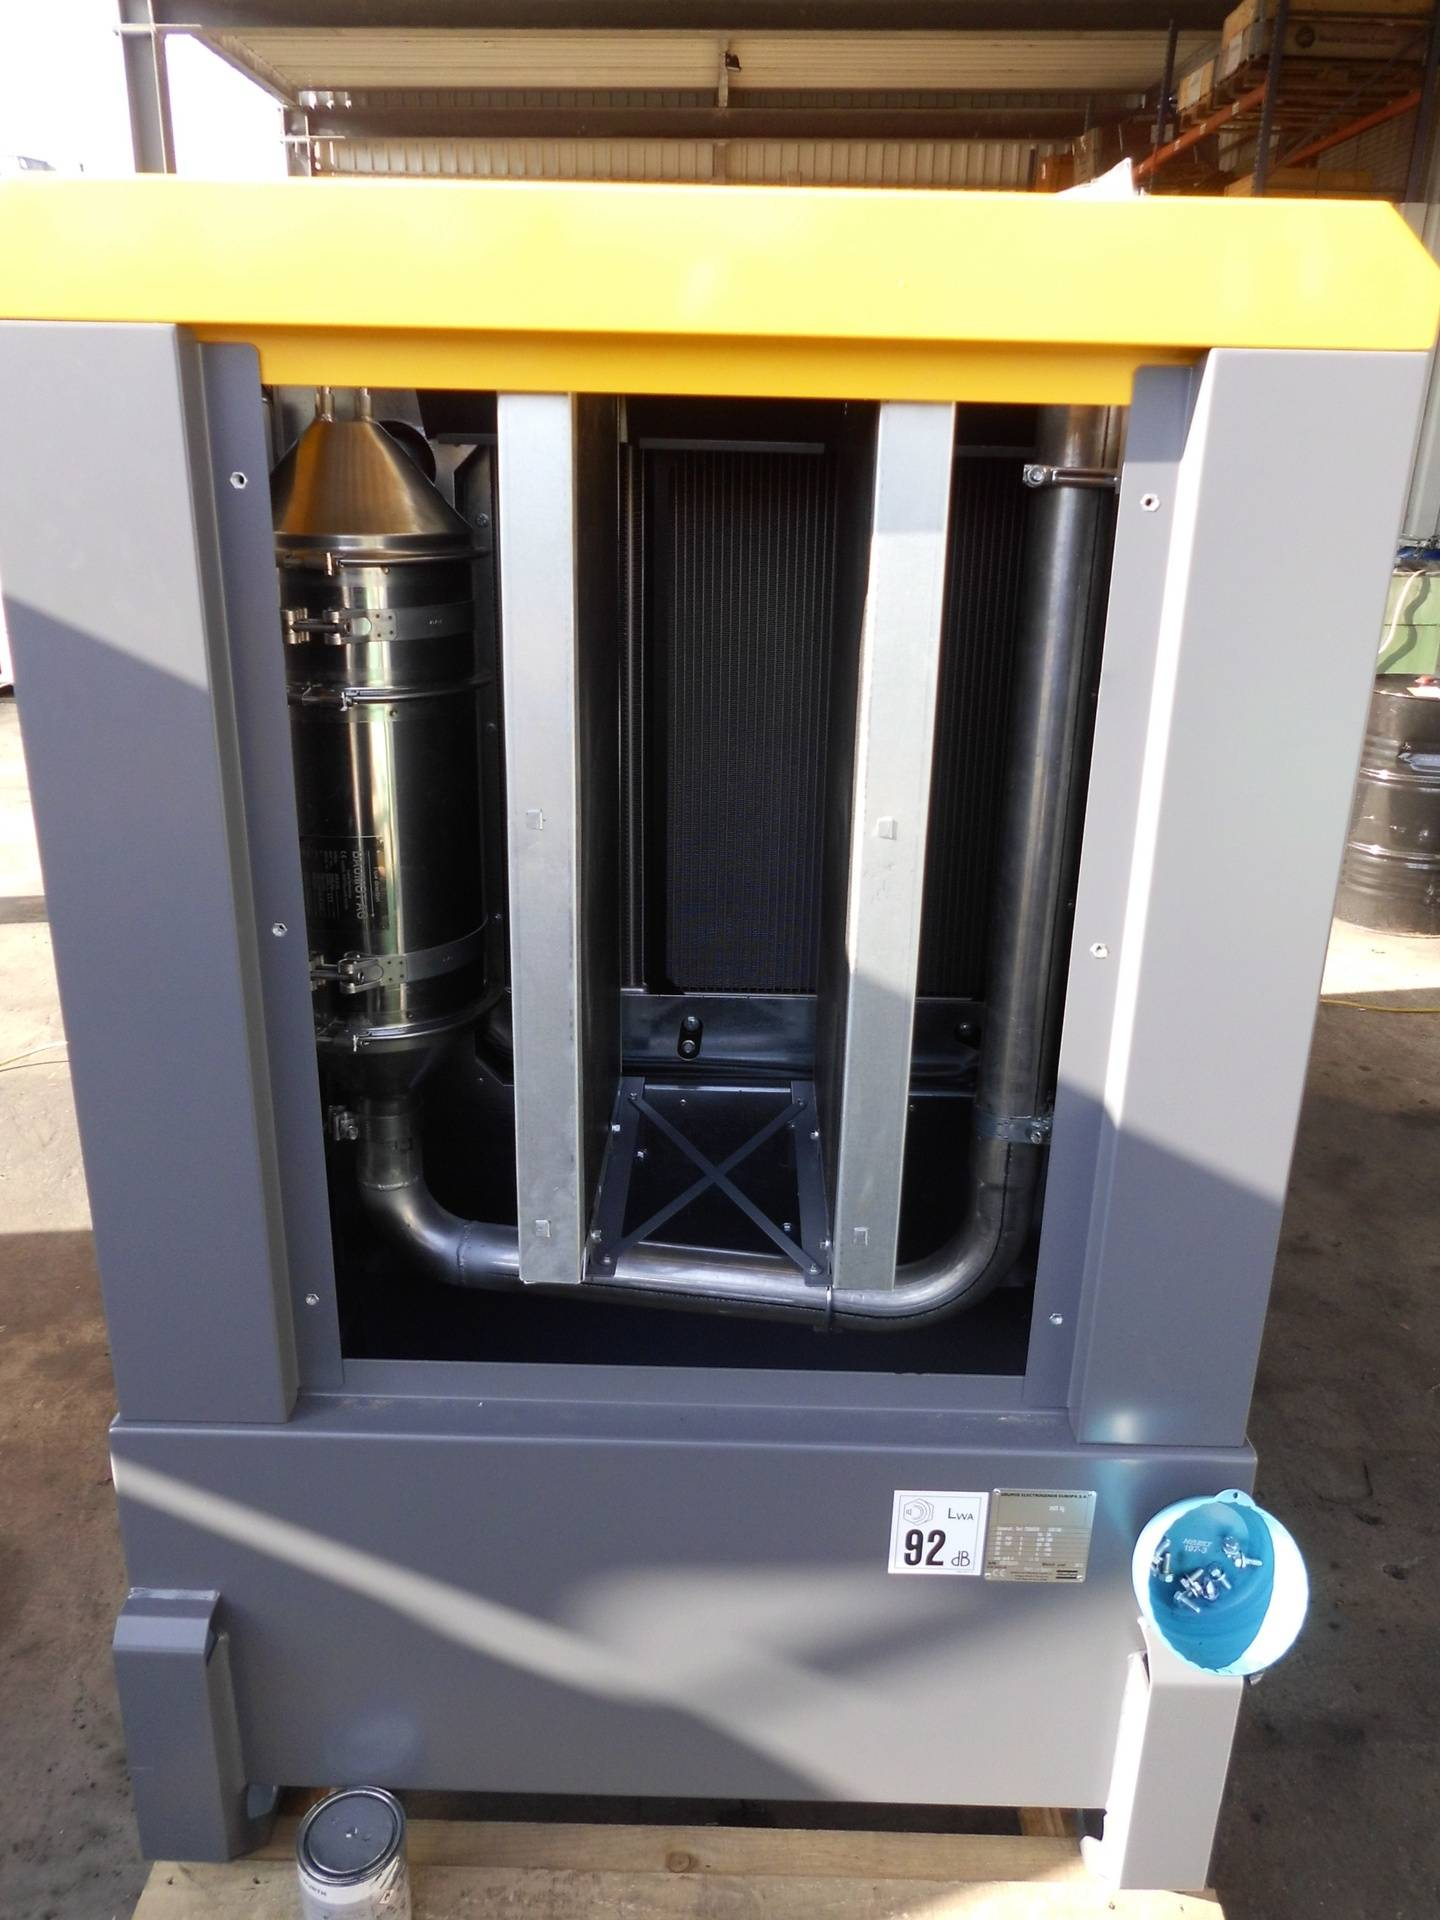 Stromgenerator Atlas Copco QAS 100 mit Baumot BAB9120 Partikelfilter System